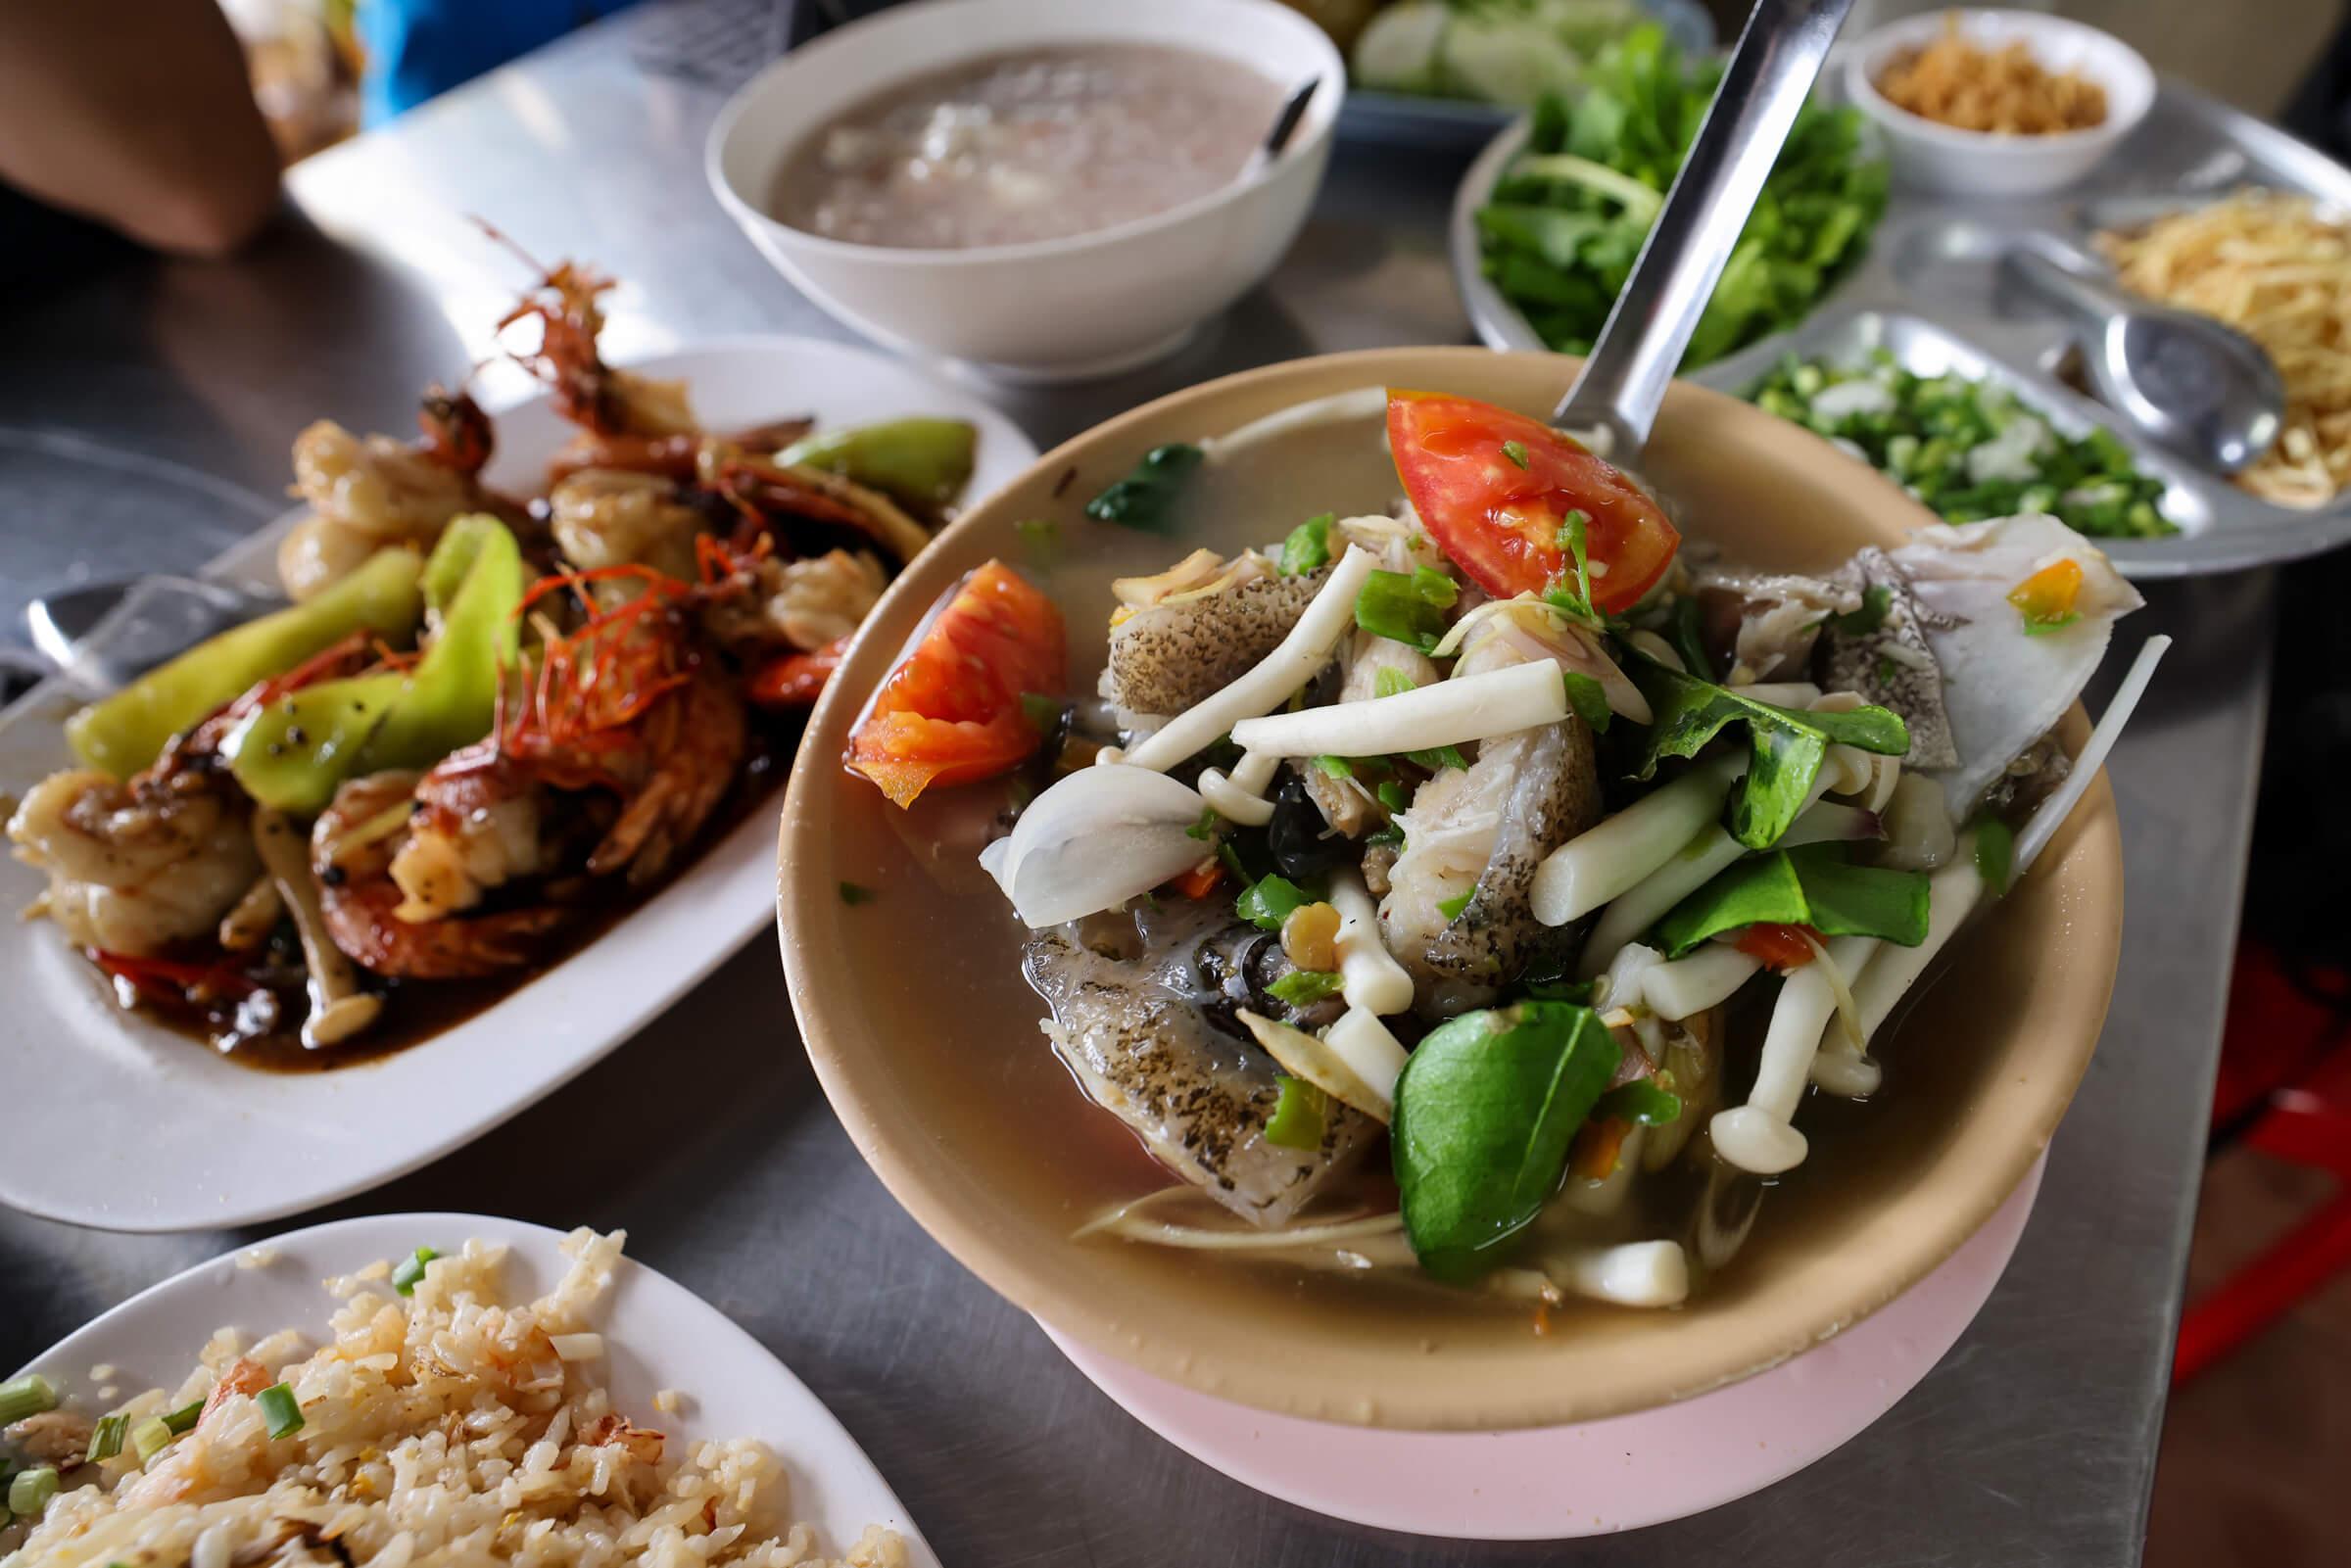 Hong Fish Congee (ฮ้อง ข้าวต้มปลา)